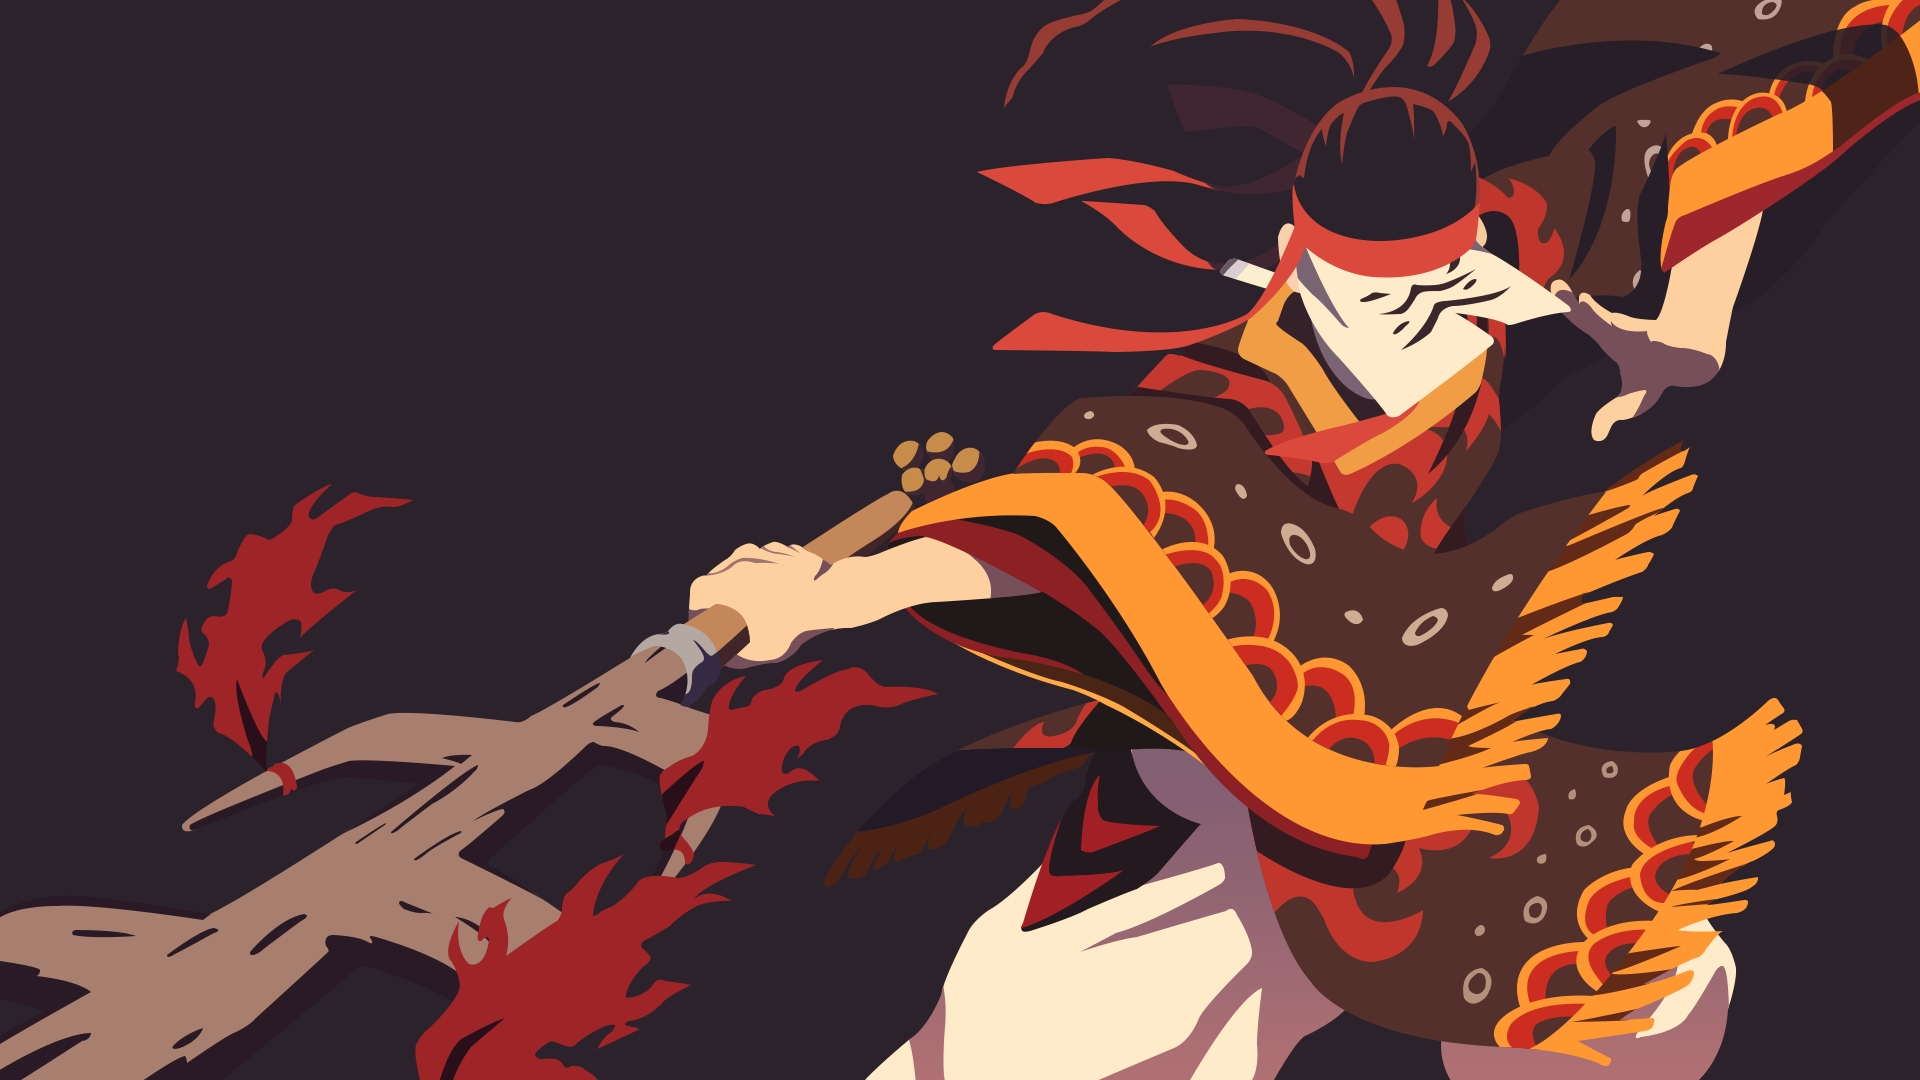 Fondos de pantalla Anime Baile Kagura de Guardianes de la noche